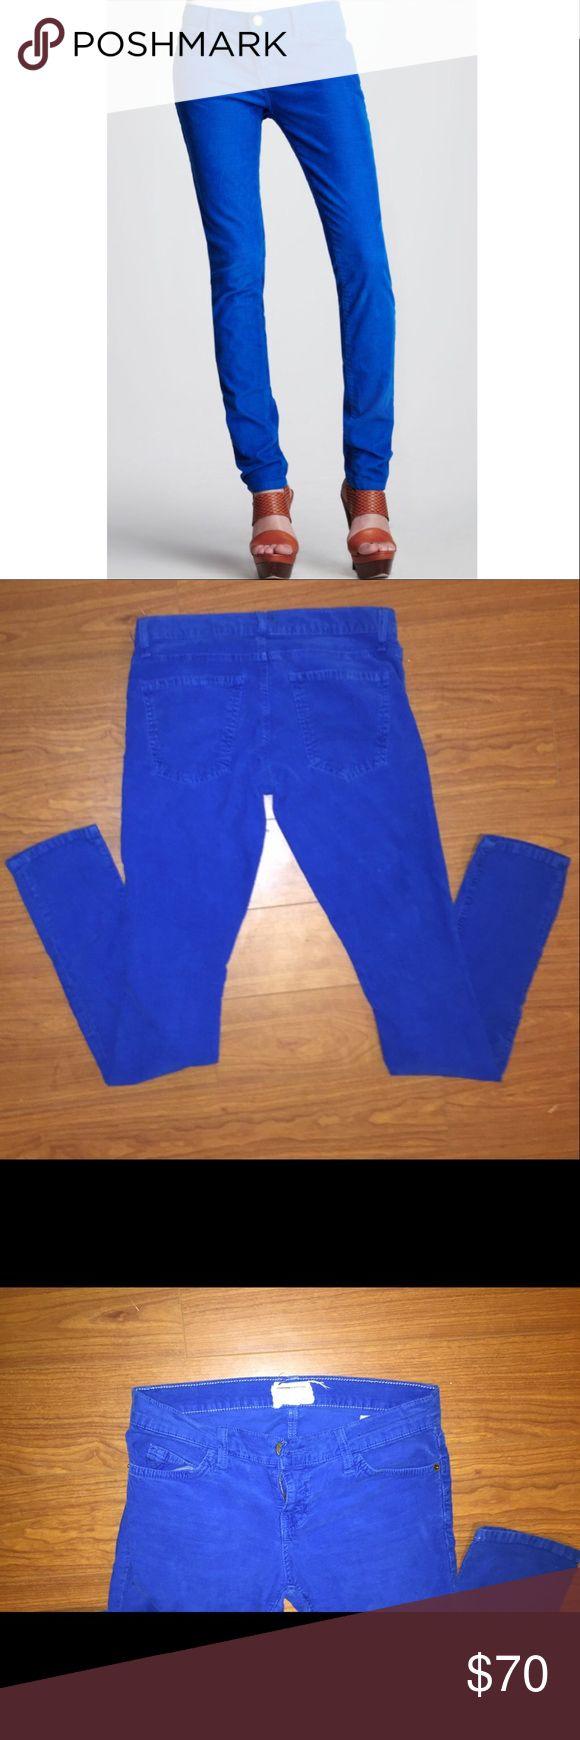 Current/Elliot The Skinny Electric Blue Cord Super cute and comfy electric blue corduroy skinny jeans Current/Elliott Pants Skinny